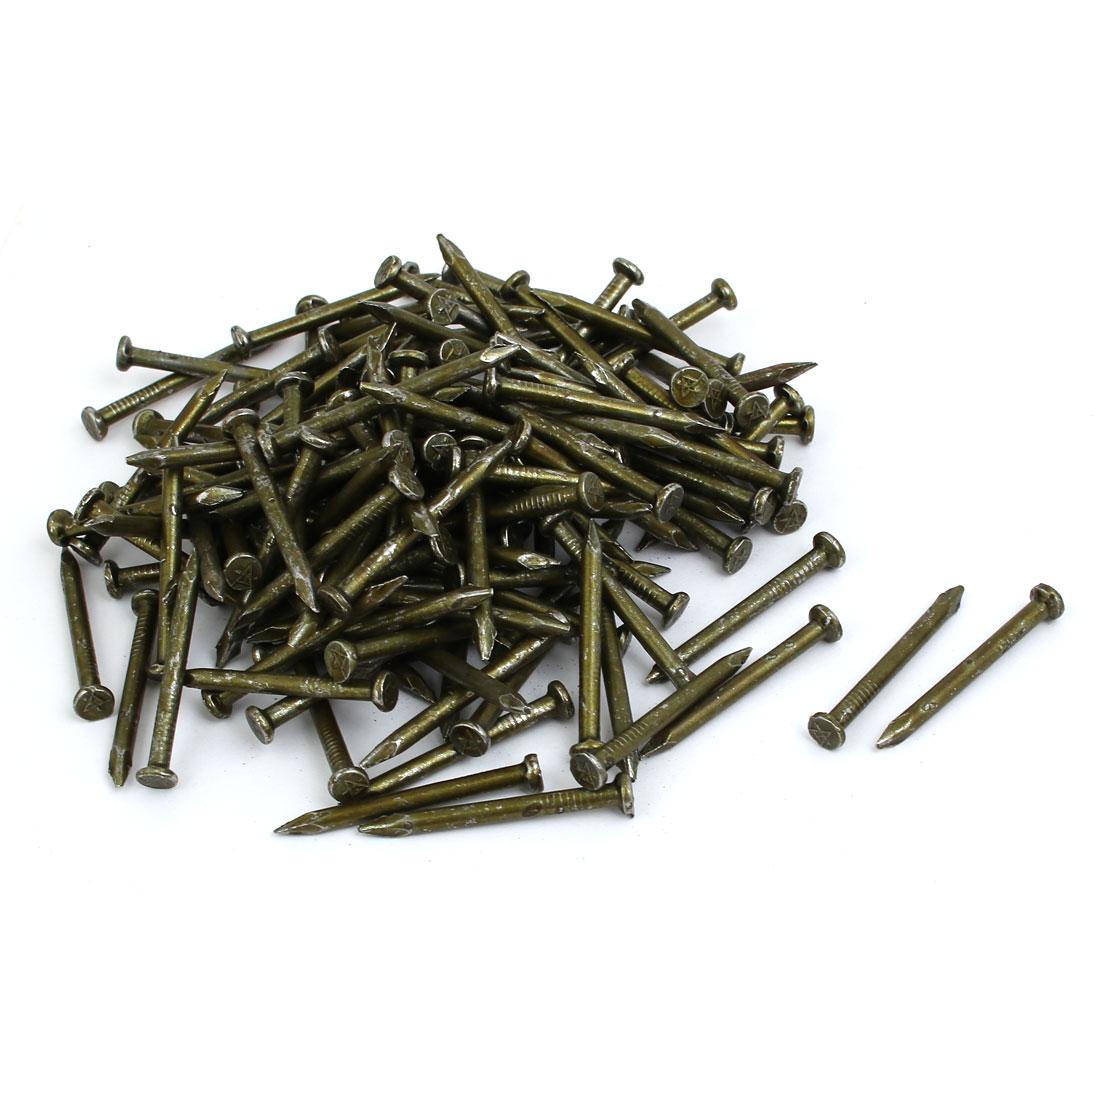 Fiber Concrete Cement Wall Carbon Steel Point Tip Wire Nails 3.4mmx40mm 200PCS